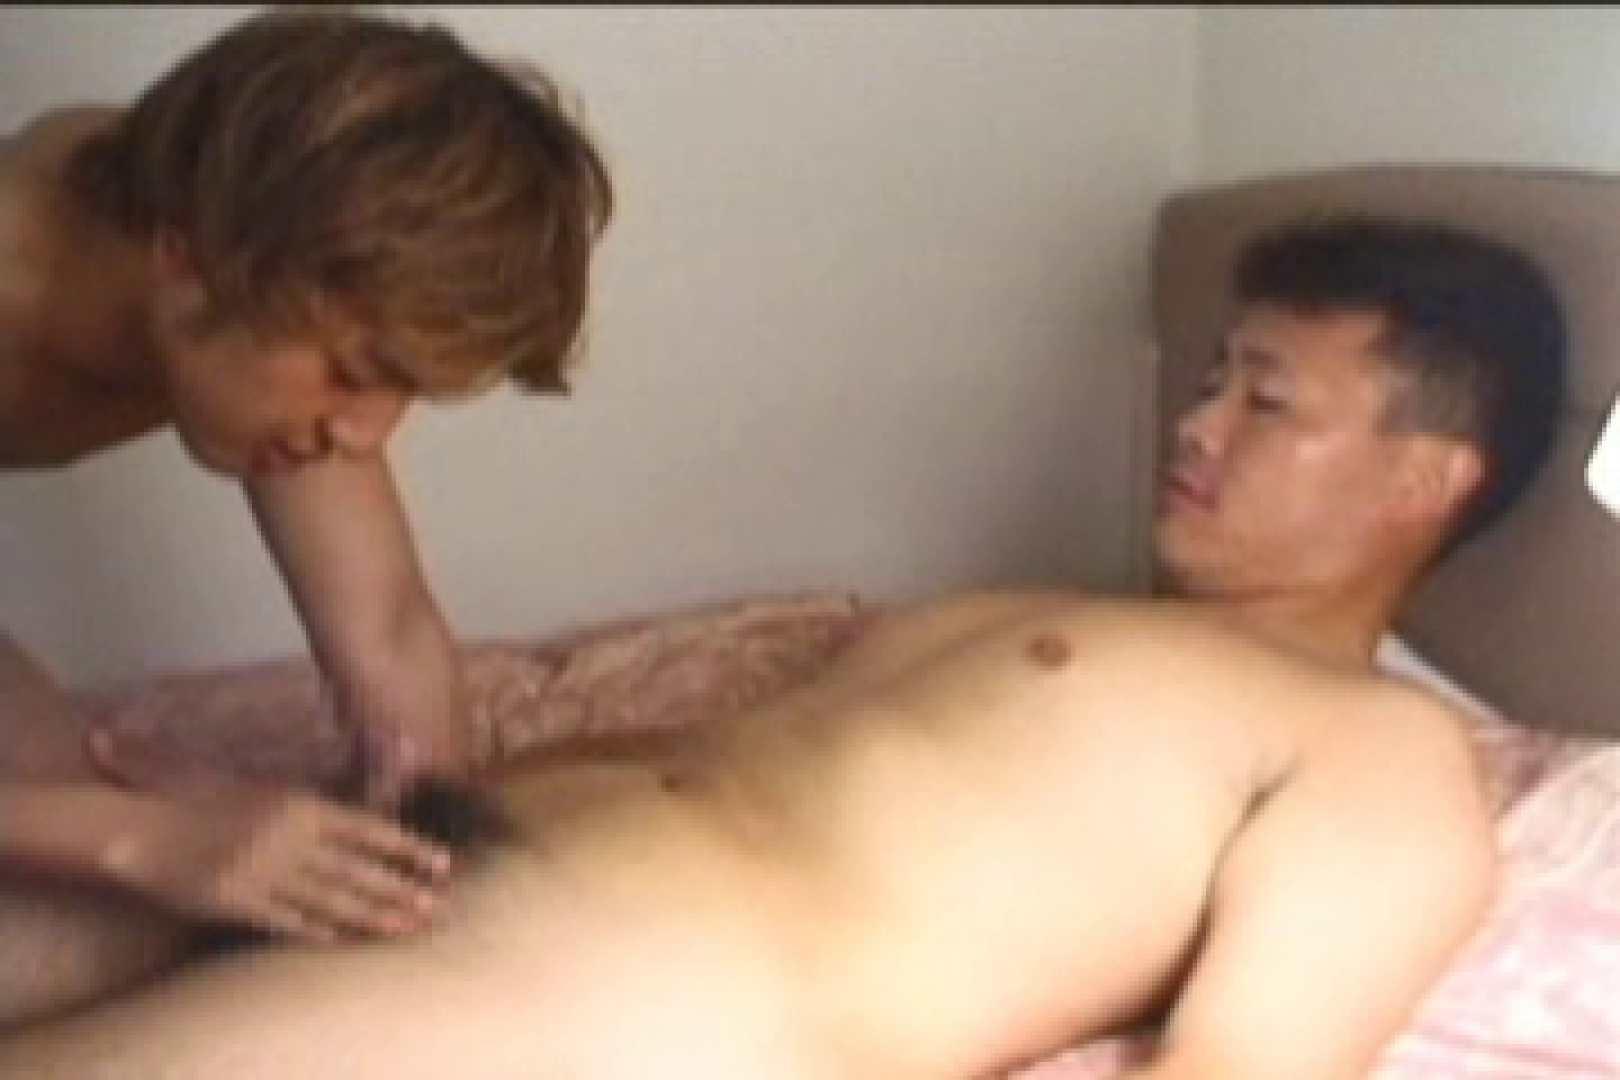 Scoop ! ! 発情した男の生堀り・ガン掘りSEX stage.5 手コキ AV動画 80枚 21